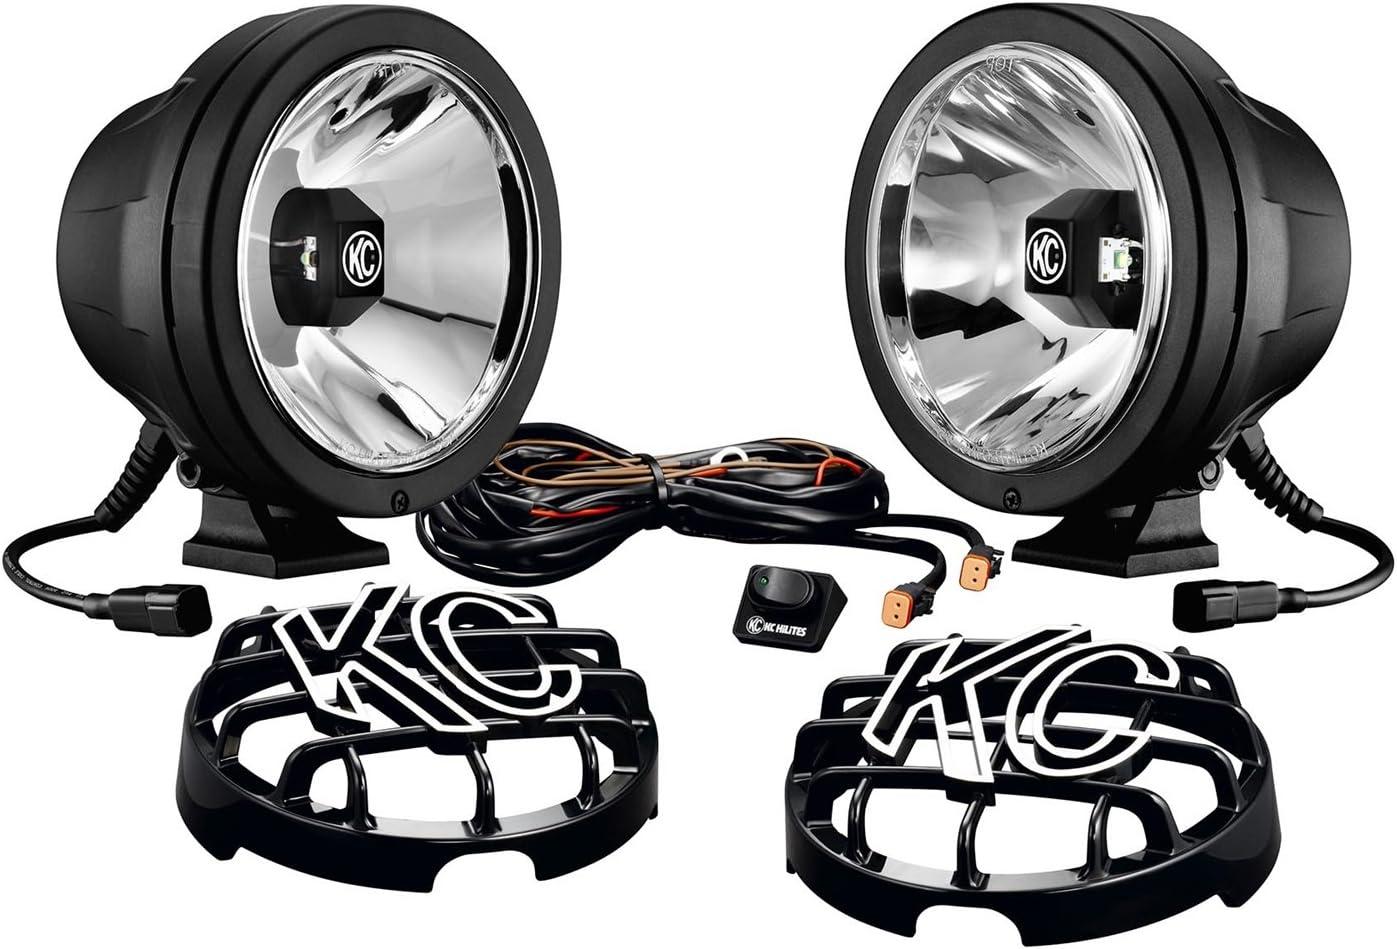 KC HiLiTES 644 6-Inch Pro Sport LED Drive Beam Pack - Pair: Automotive